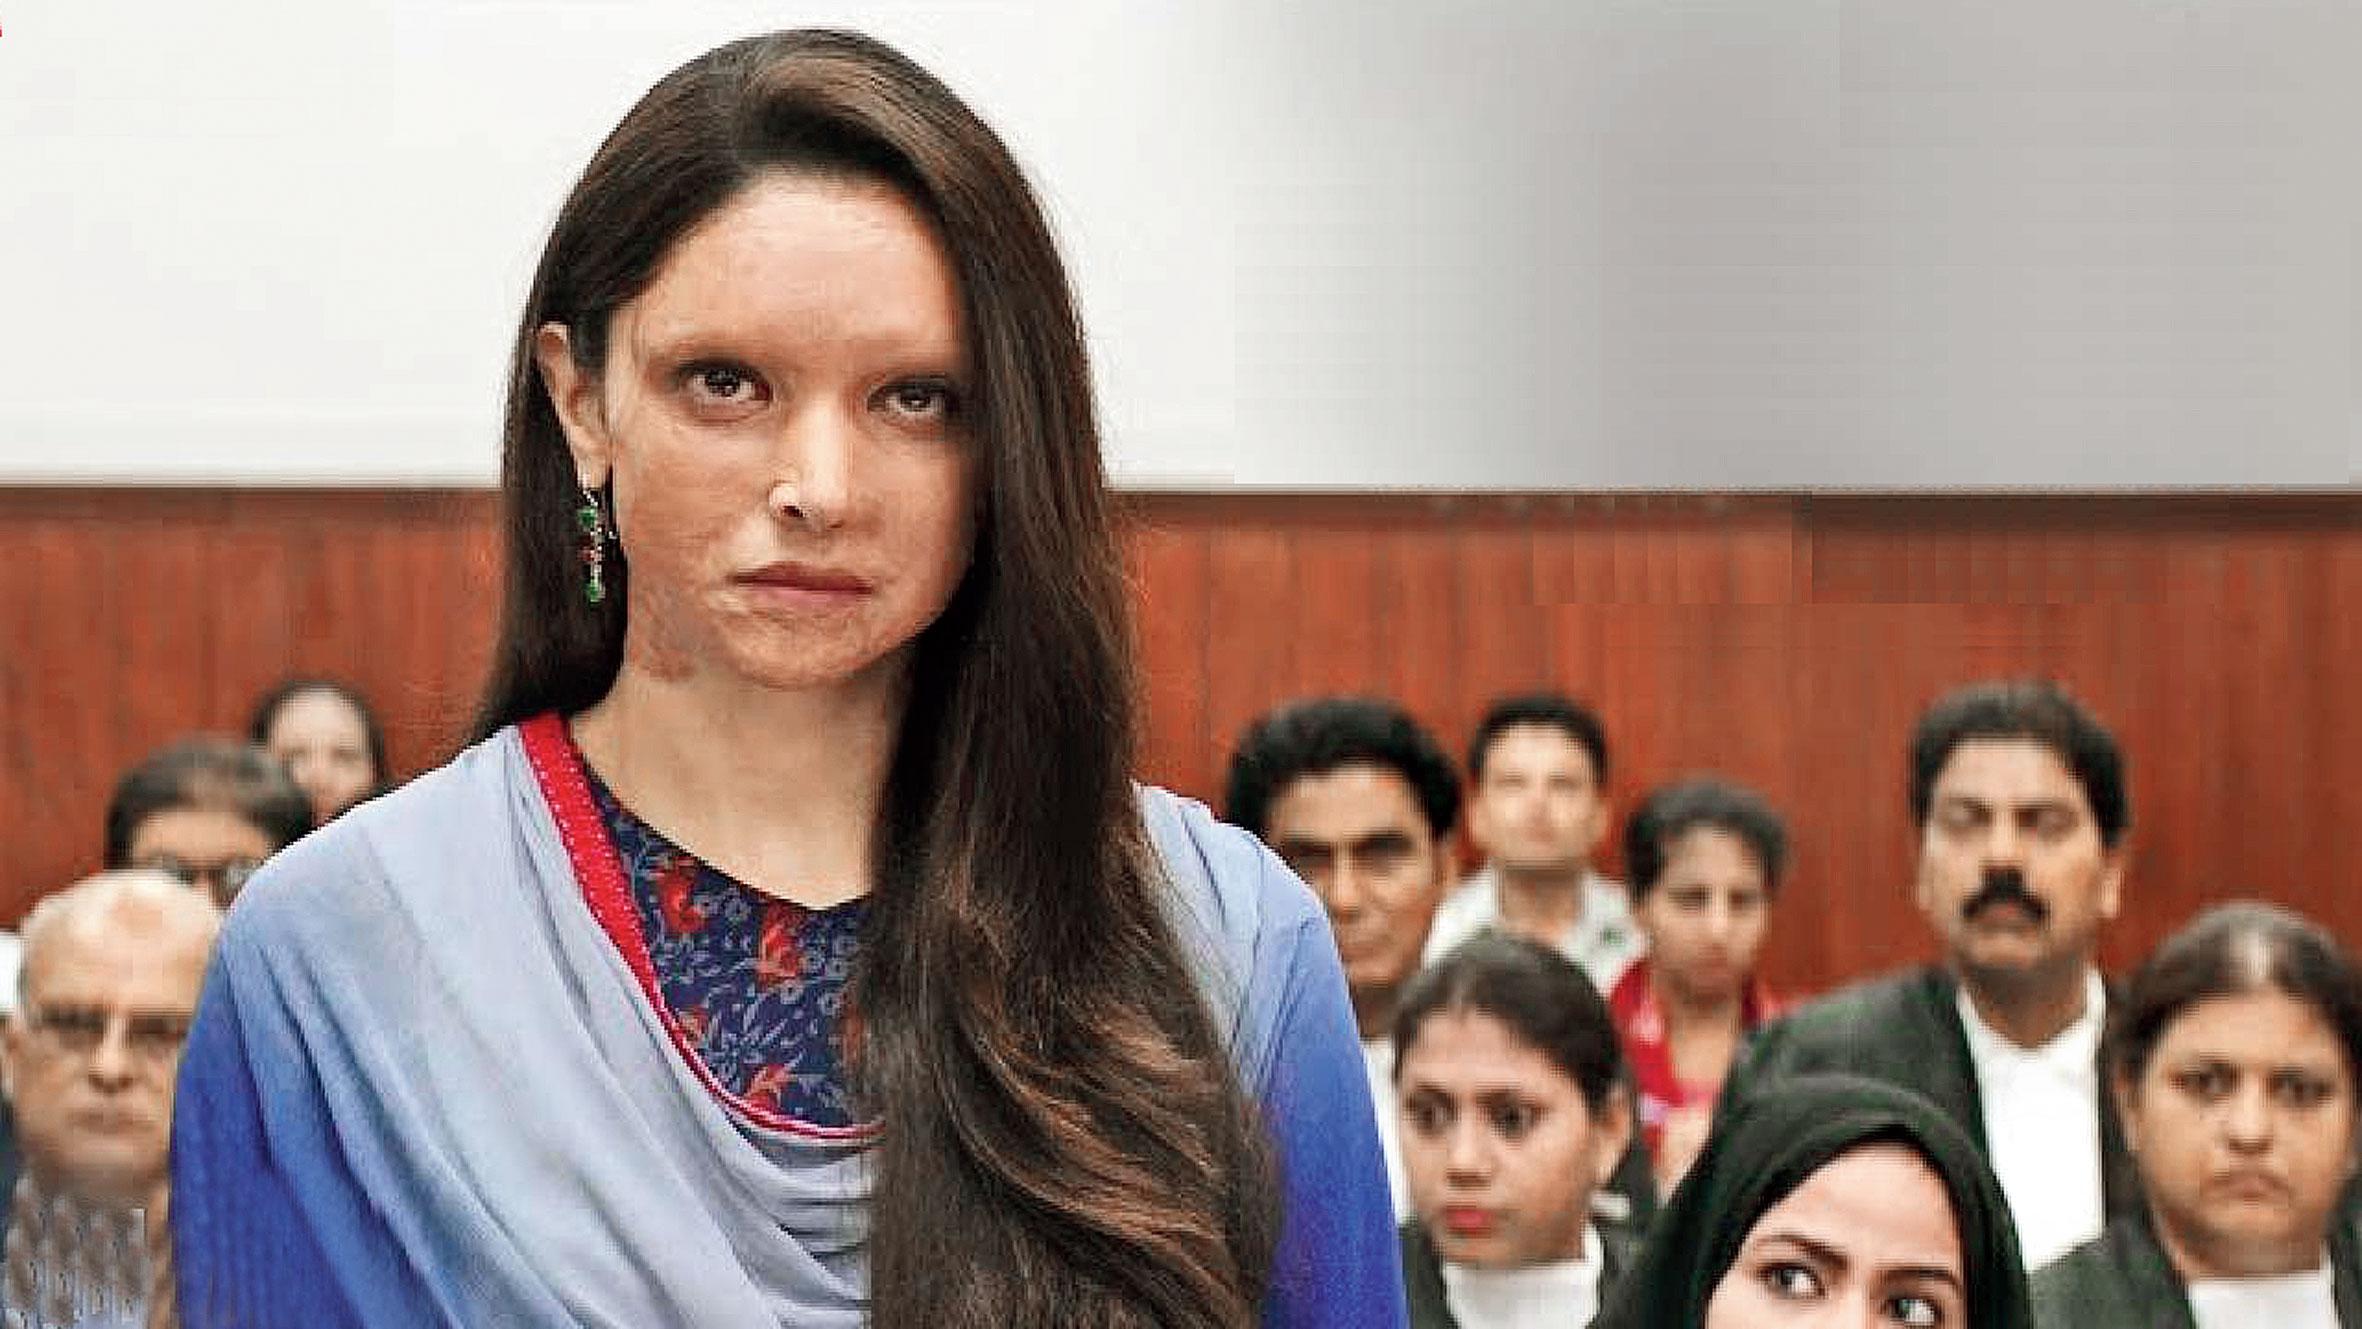 Deepika Padukone as Malti in Chhapaak